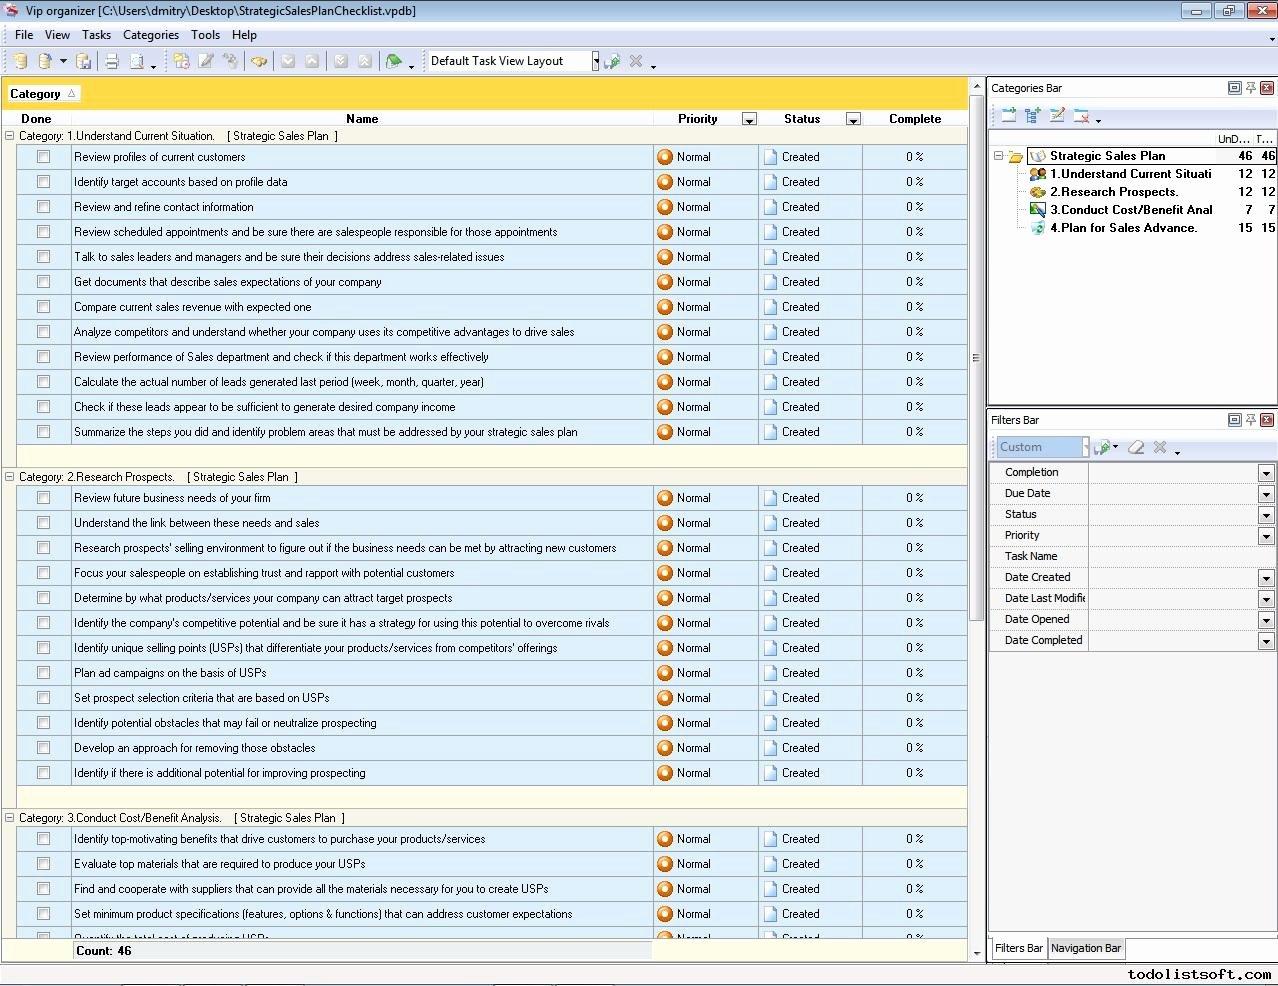 Strategic Sales Plan Template Unique Strategic Sales Plan Checklist to Do List organizer